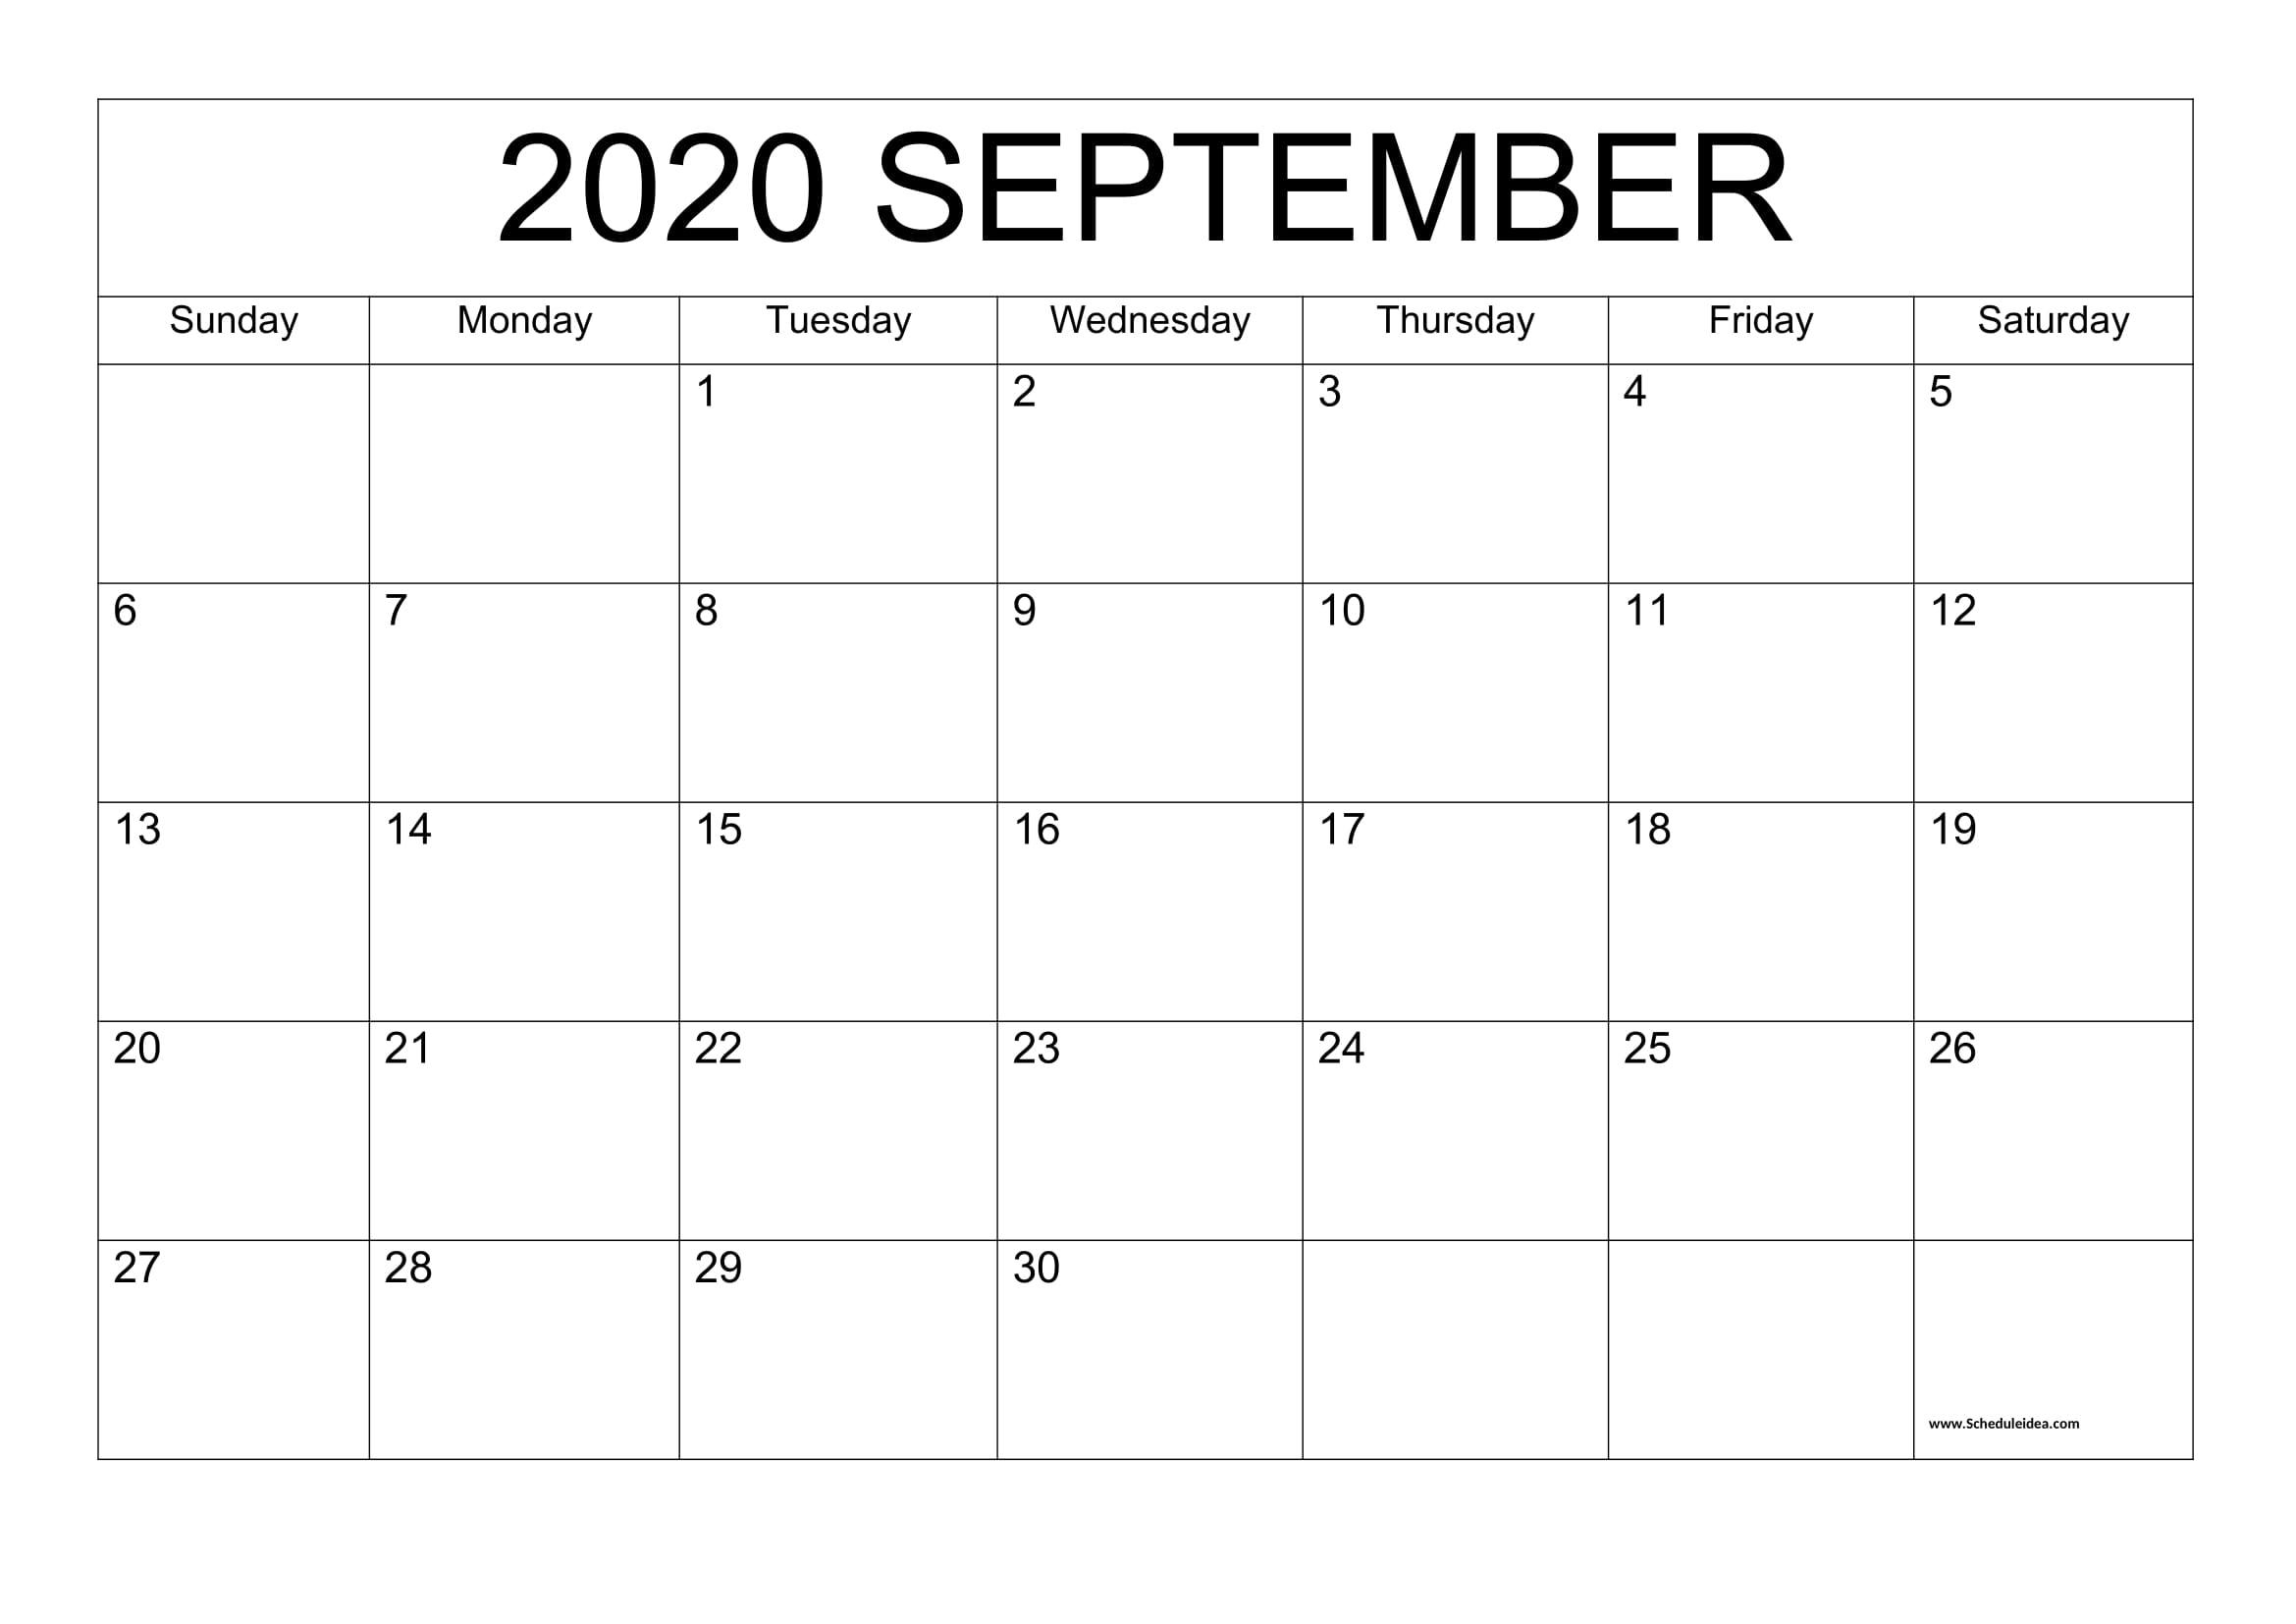 September 2020 Printable Calendar - Editable Templates